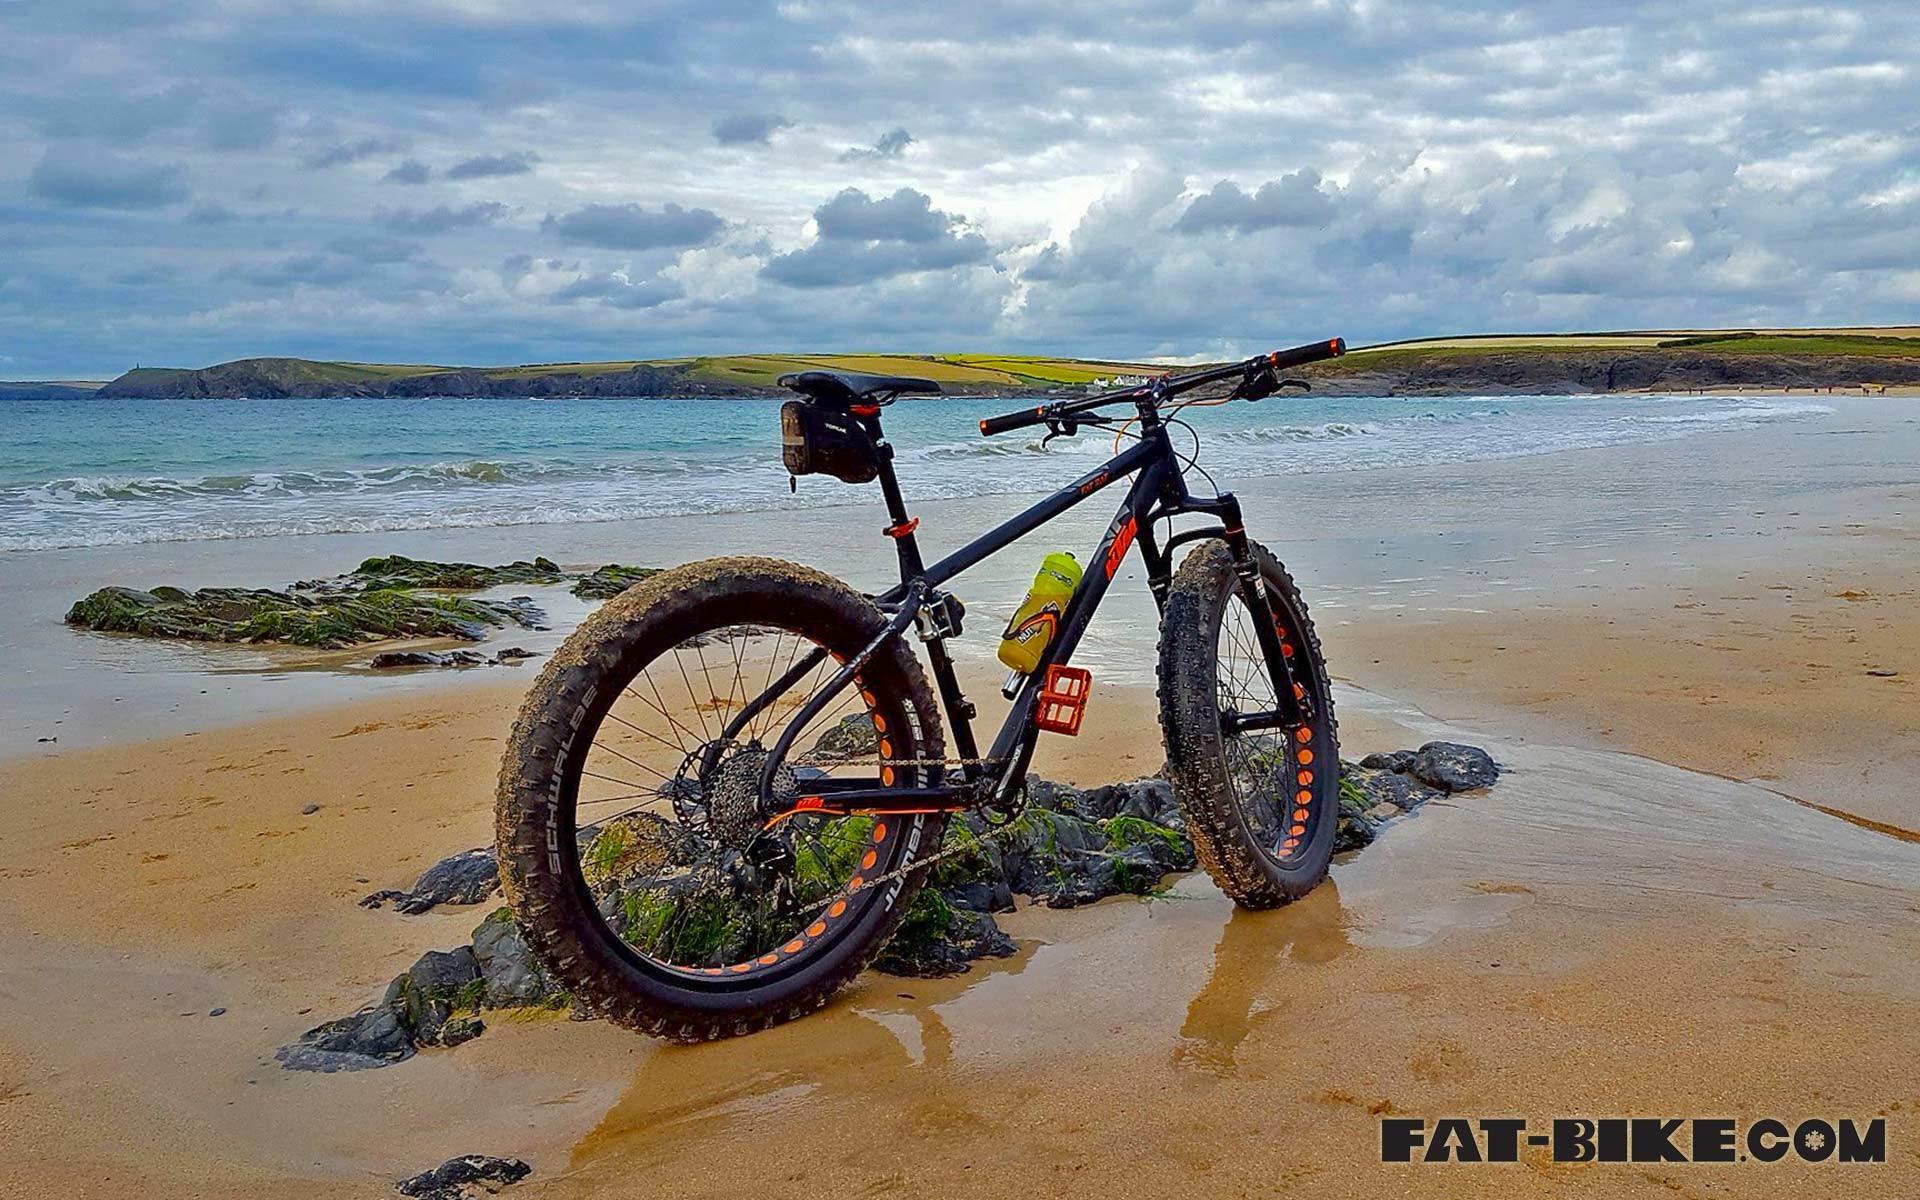 55 Ktm Wallpaper Dirt Bike